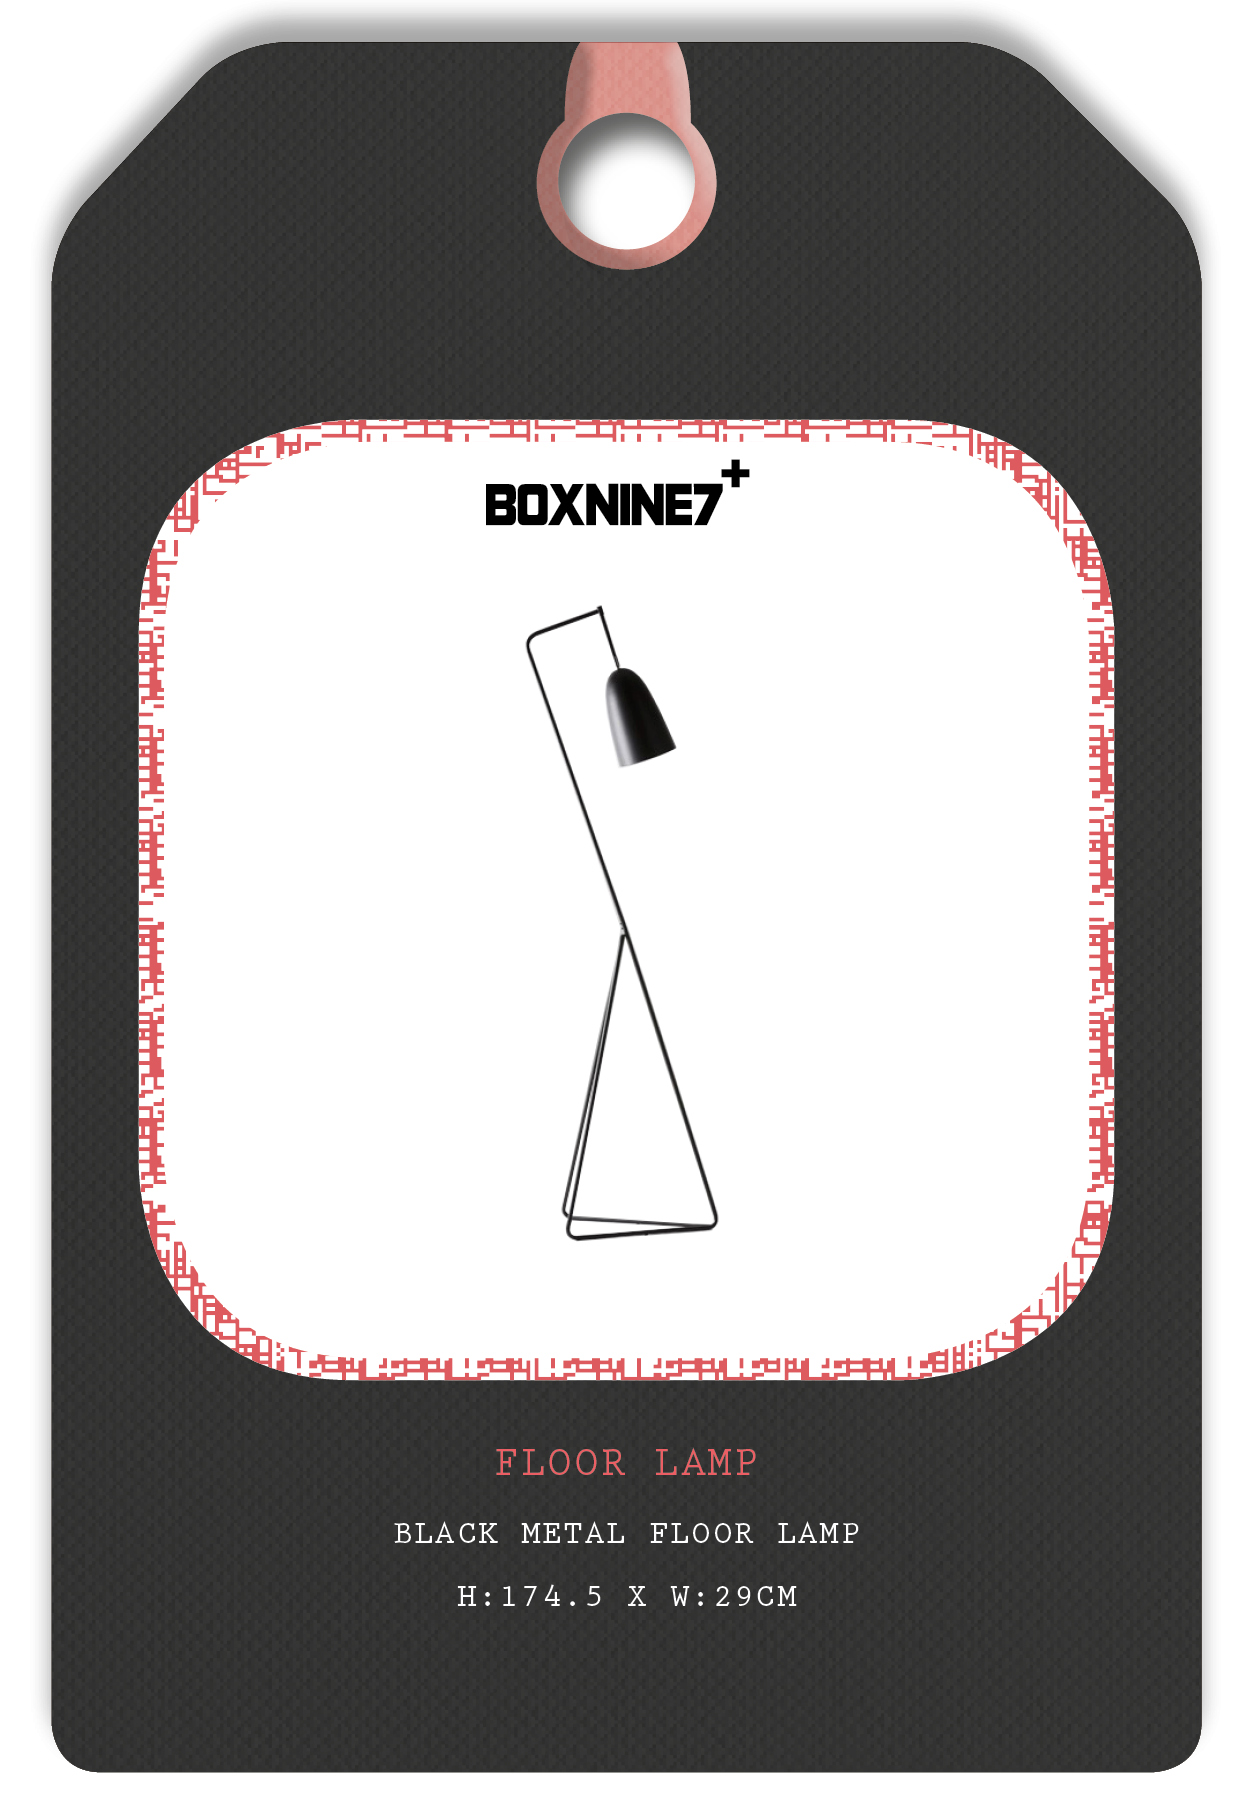 B97_Postcards - Replacement Lamp.jpg